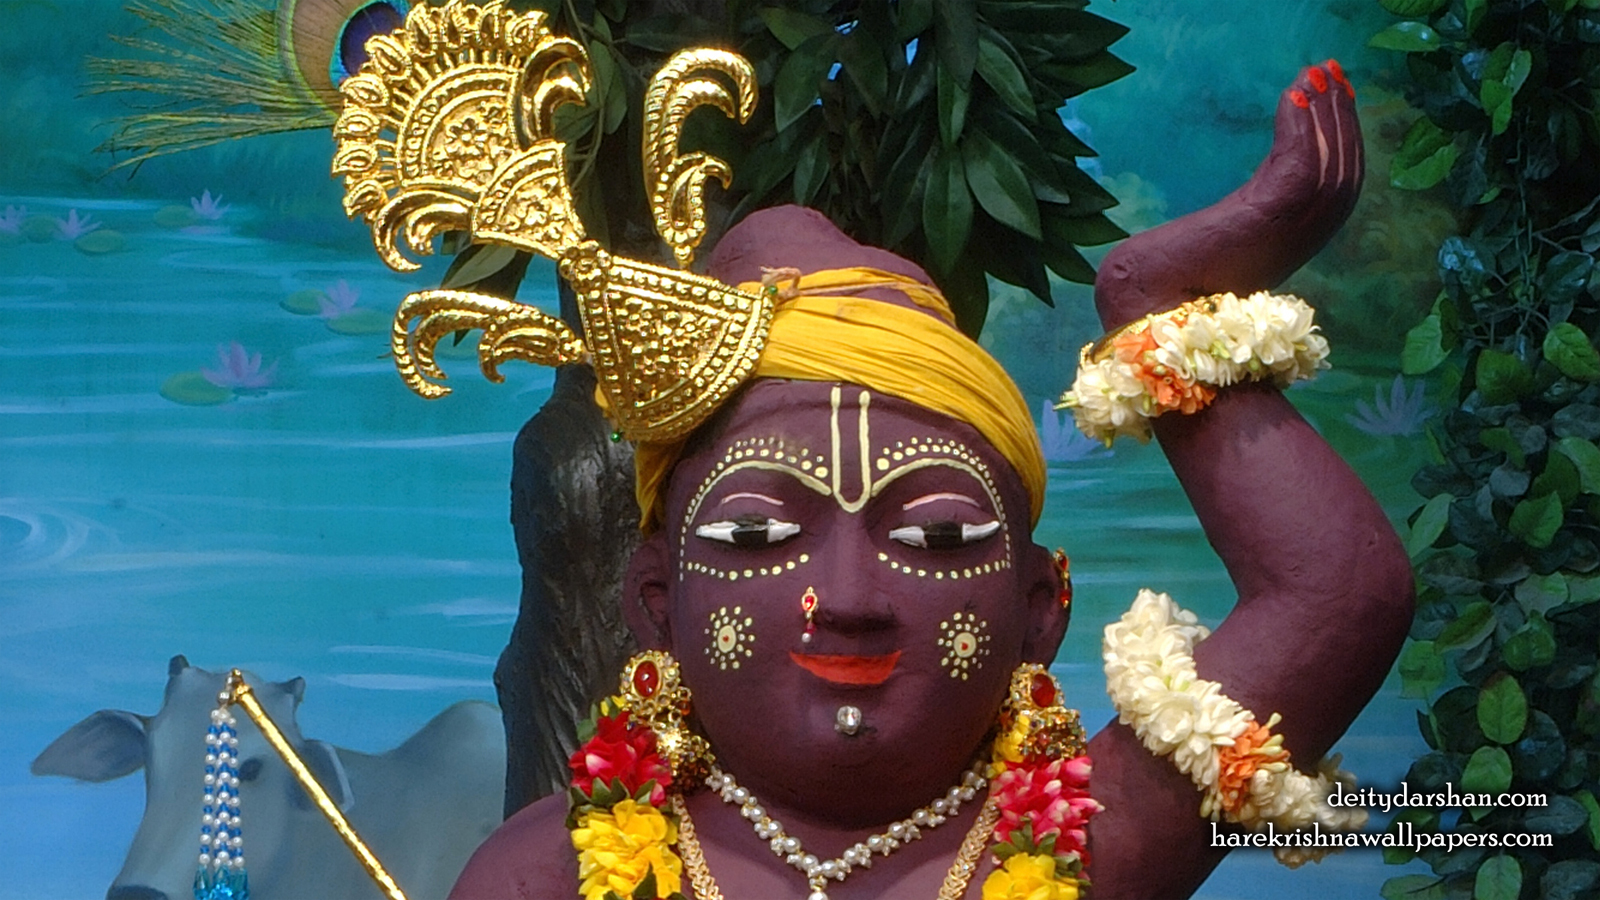 Sri Gopal Close up Wallpaper (031) Size 1600x900 Download